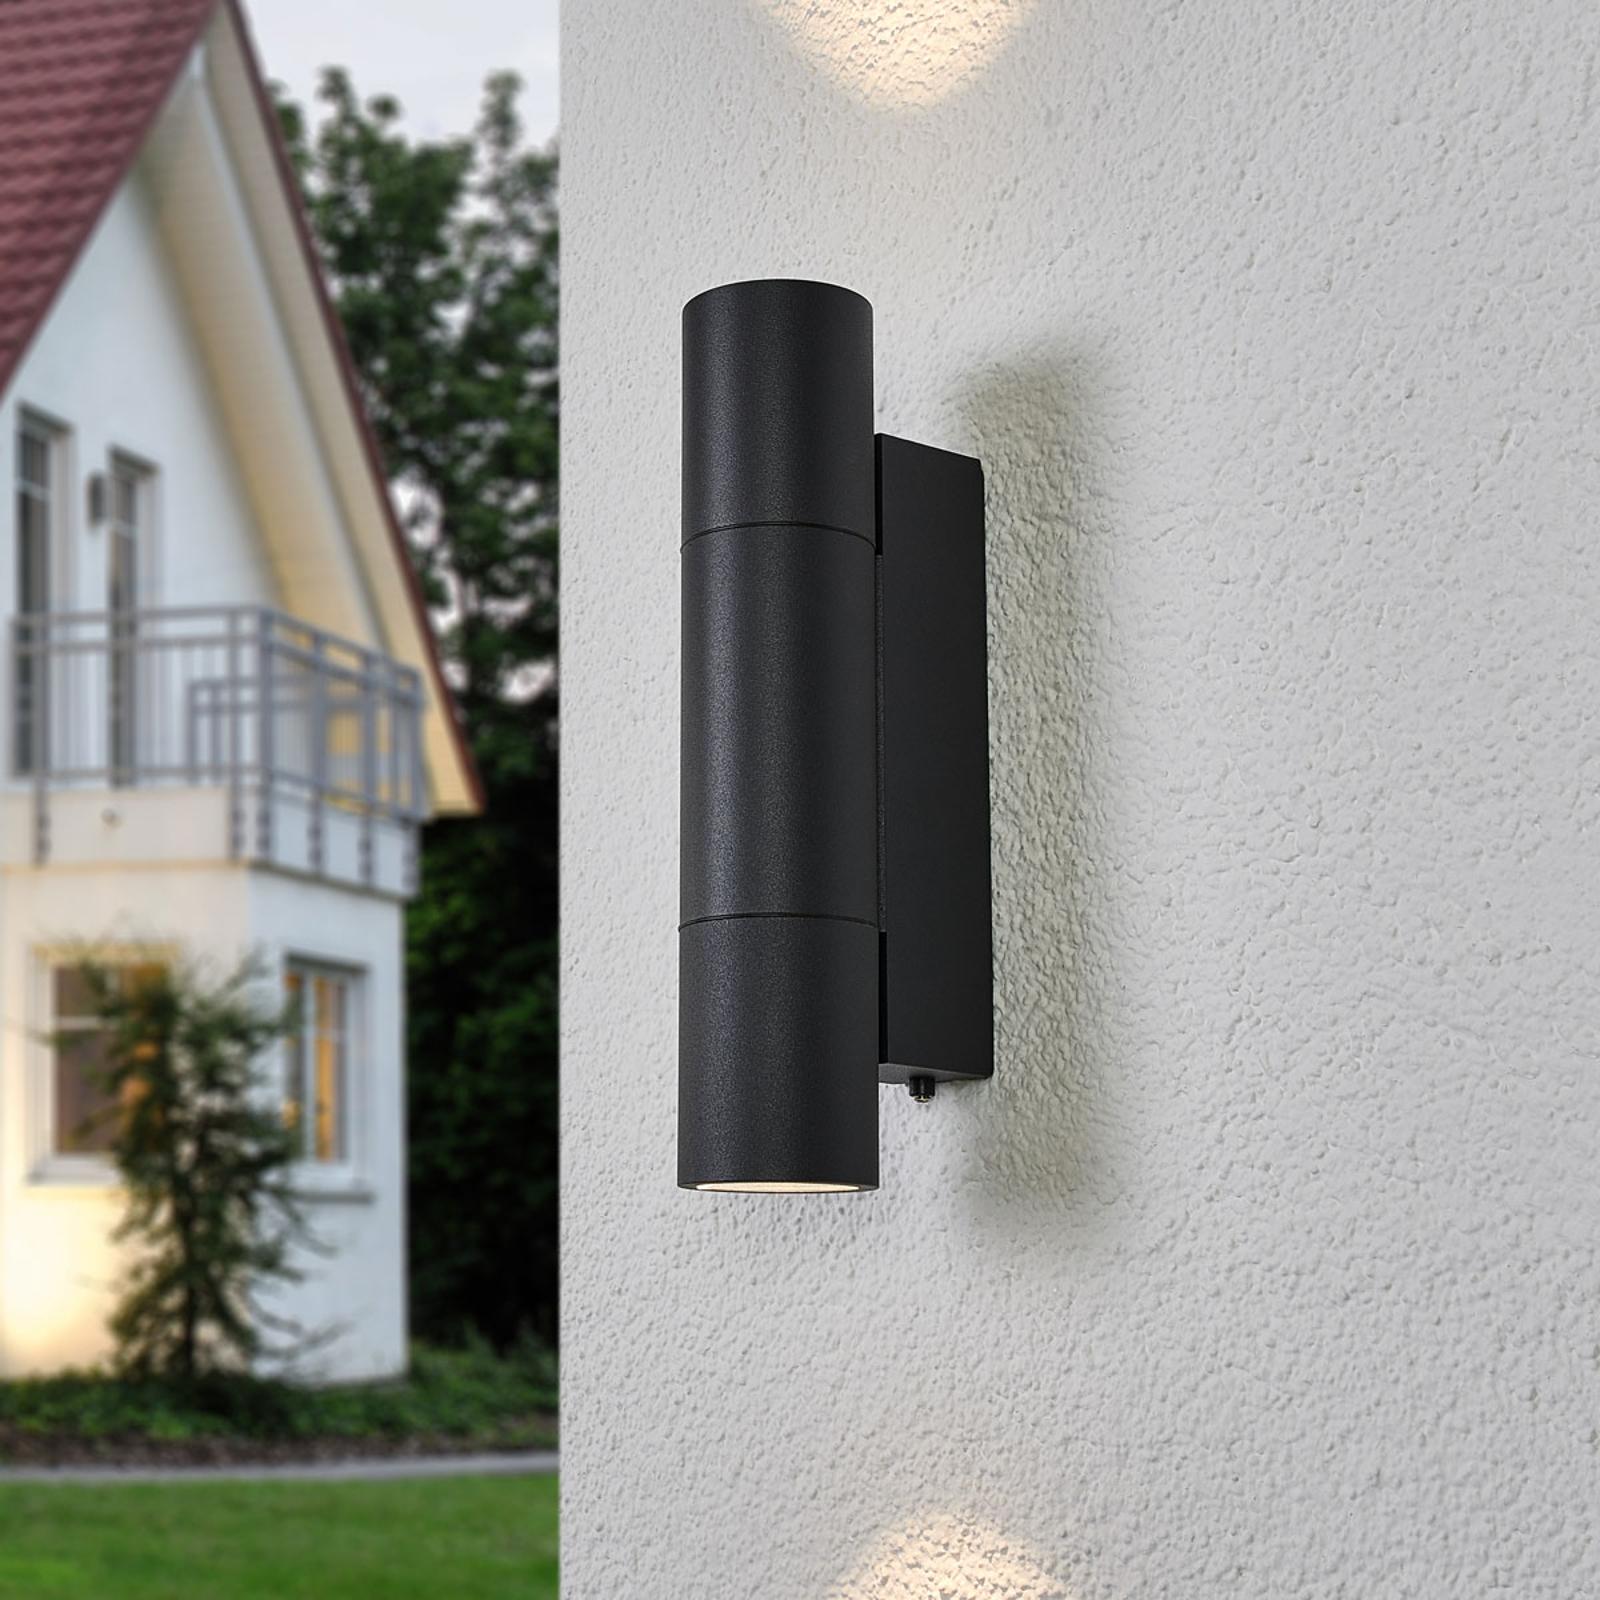 BEGA 66512K3 wall lamp graphite 3,000 K up/down_1566025_1